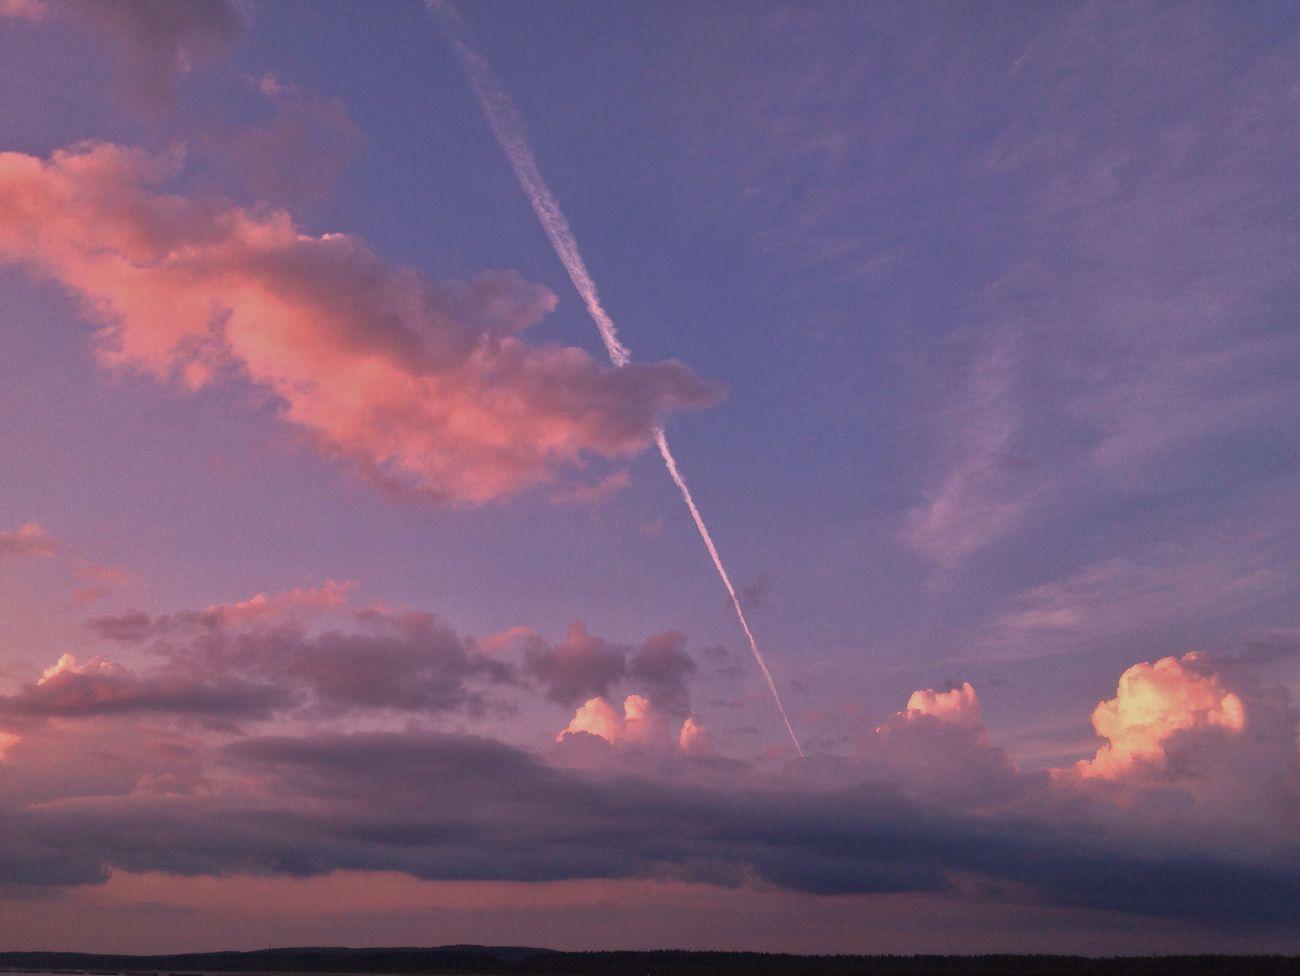 IPhone IPhoneography Mobilephotography EyeEm Nature Lover Beauty In Nature Beauty In Nature EvningGlow Evning Sky Sky Vapor Trail